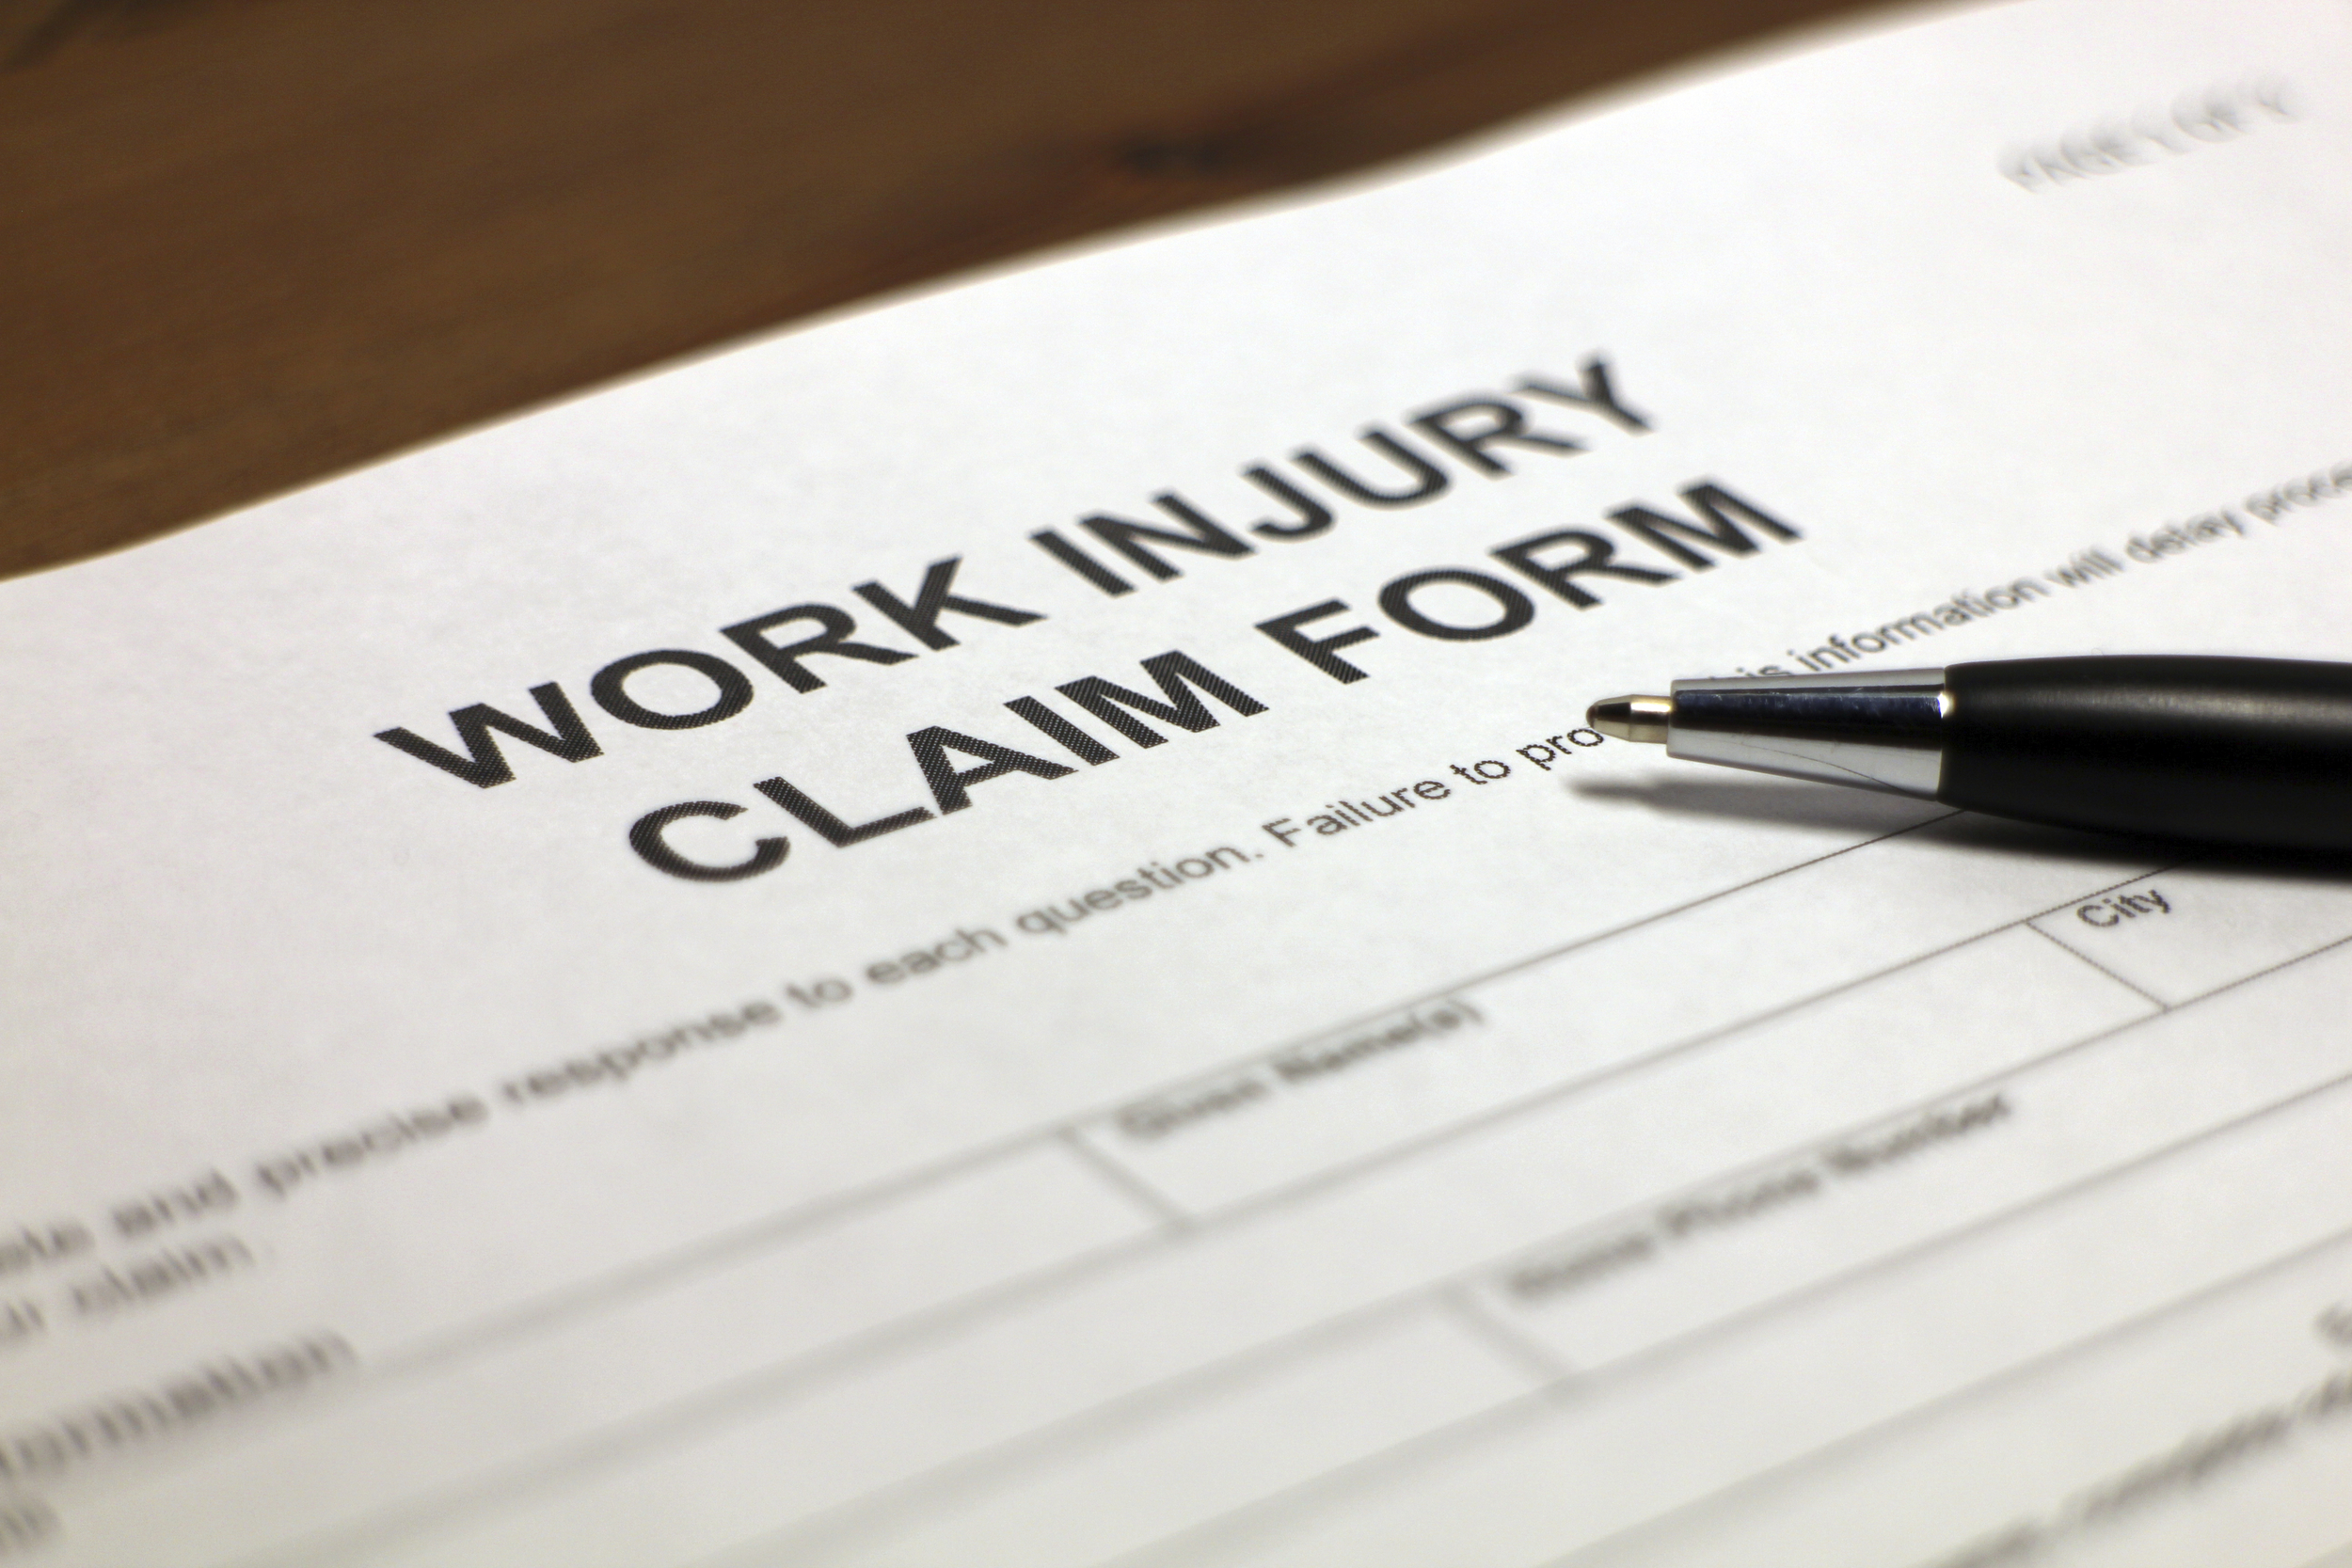 stock-photo-36758470-work-injury-claim-form.jpg